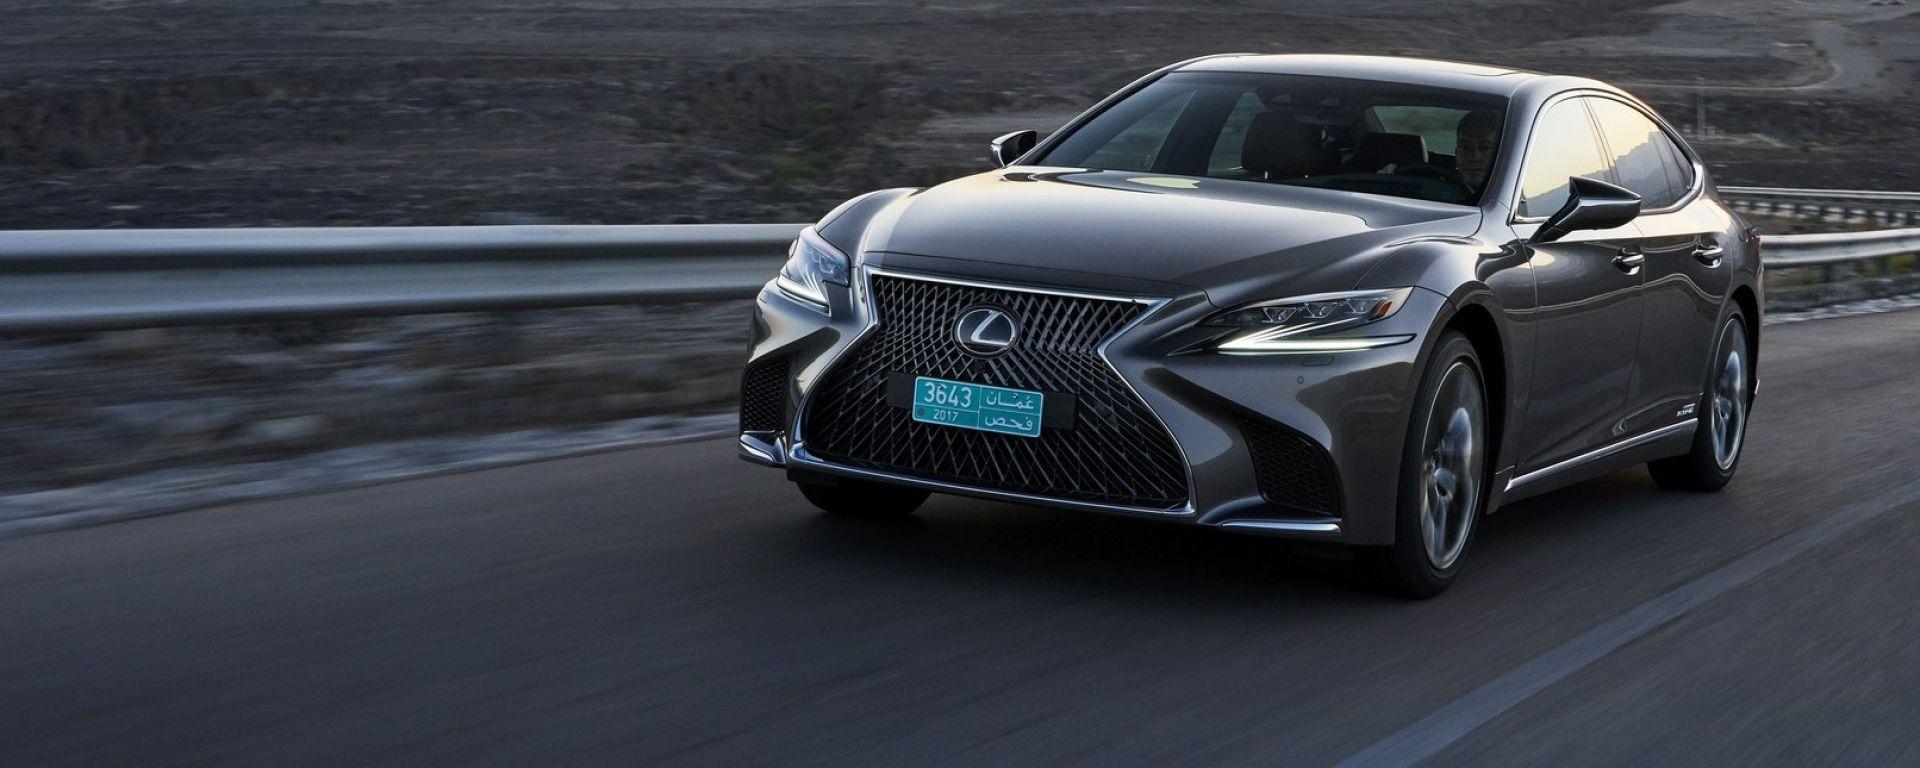 Nuova Lexus LS Hybrid 2018